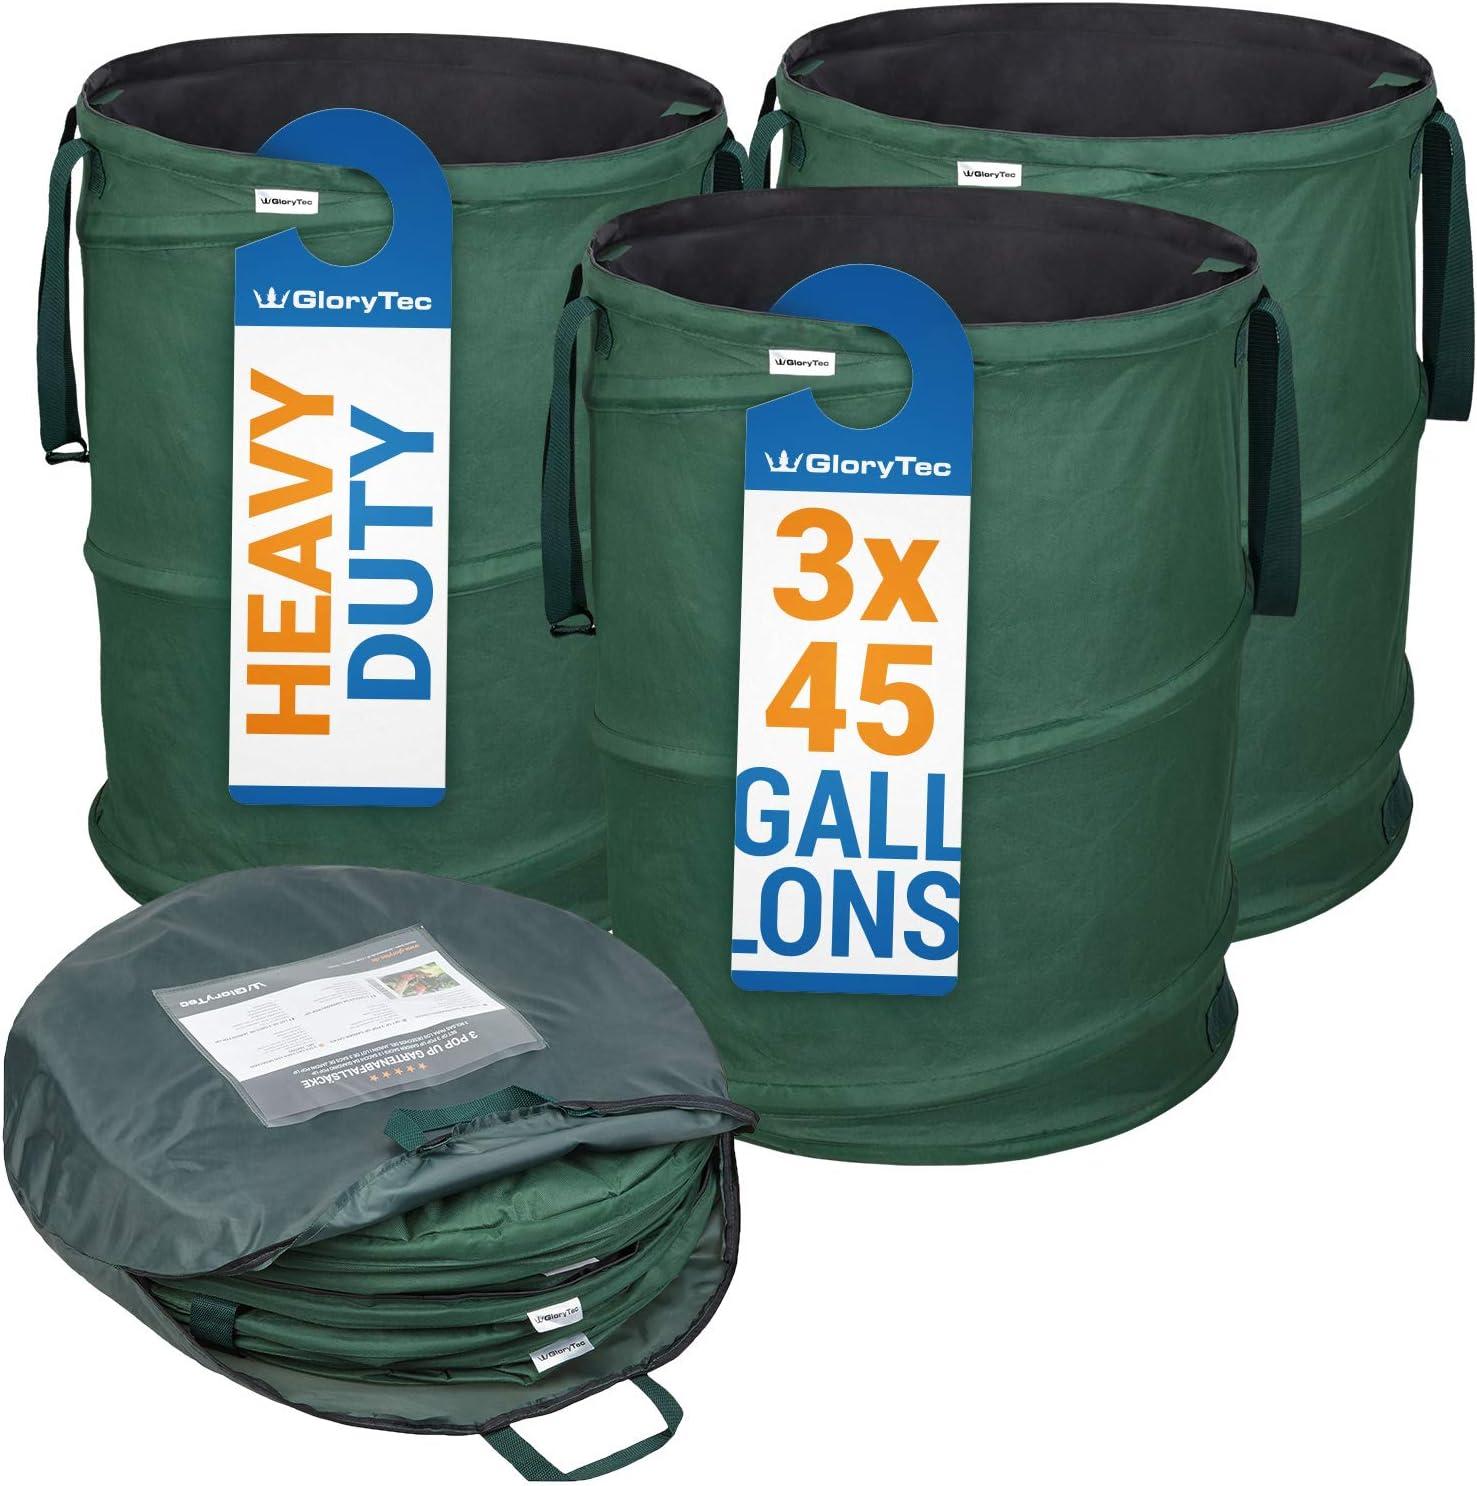 Long Beach excellence Mall GloryTec 3-Pack Collapsible Garden Bag Each Gallons 45 Heavy-D -